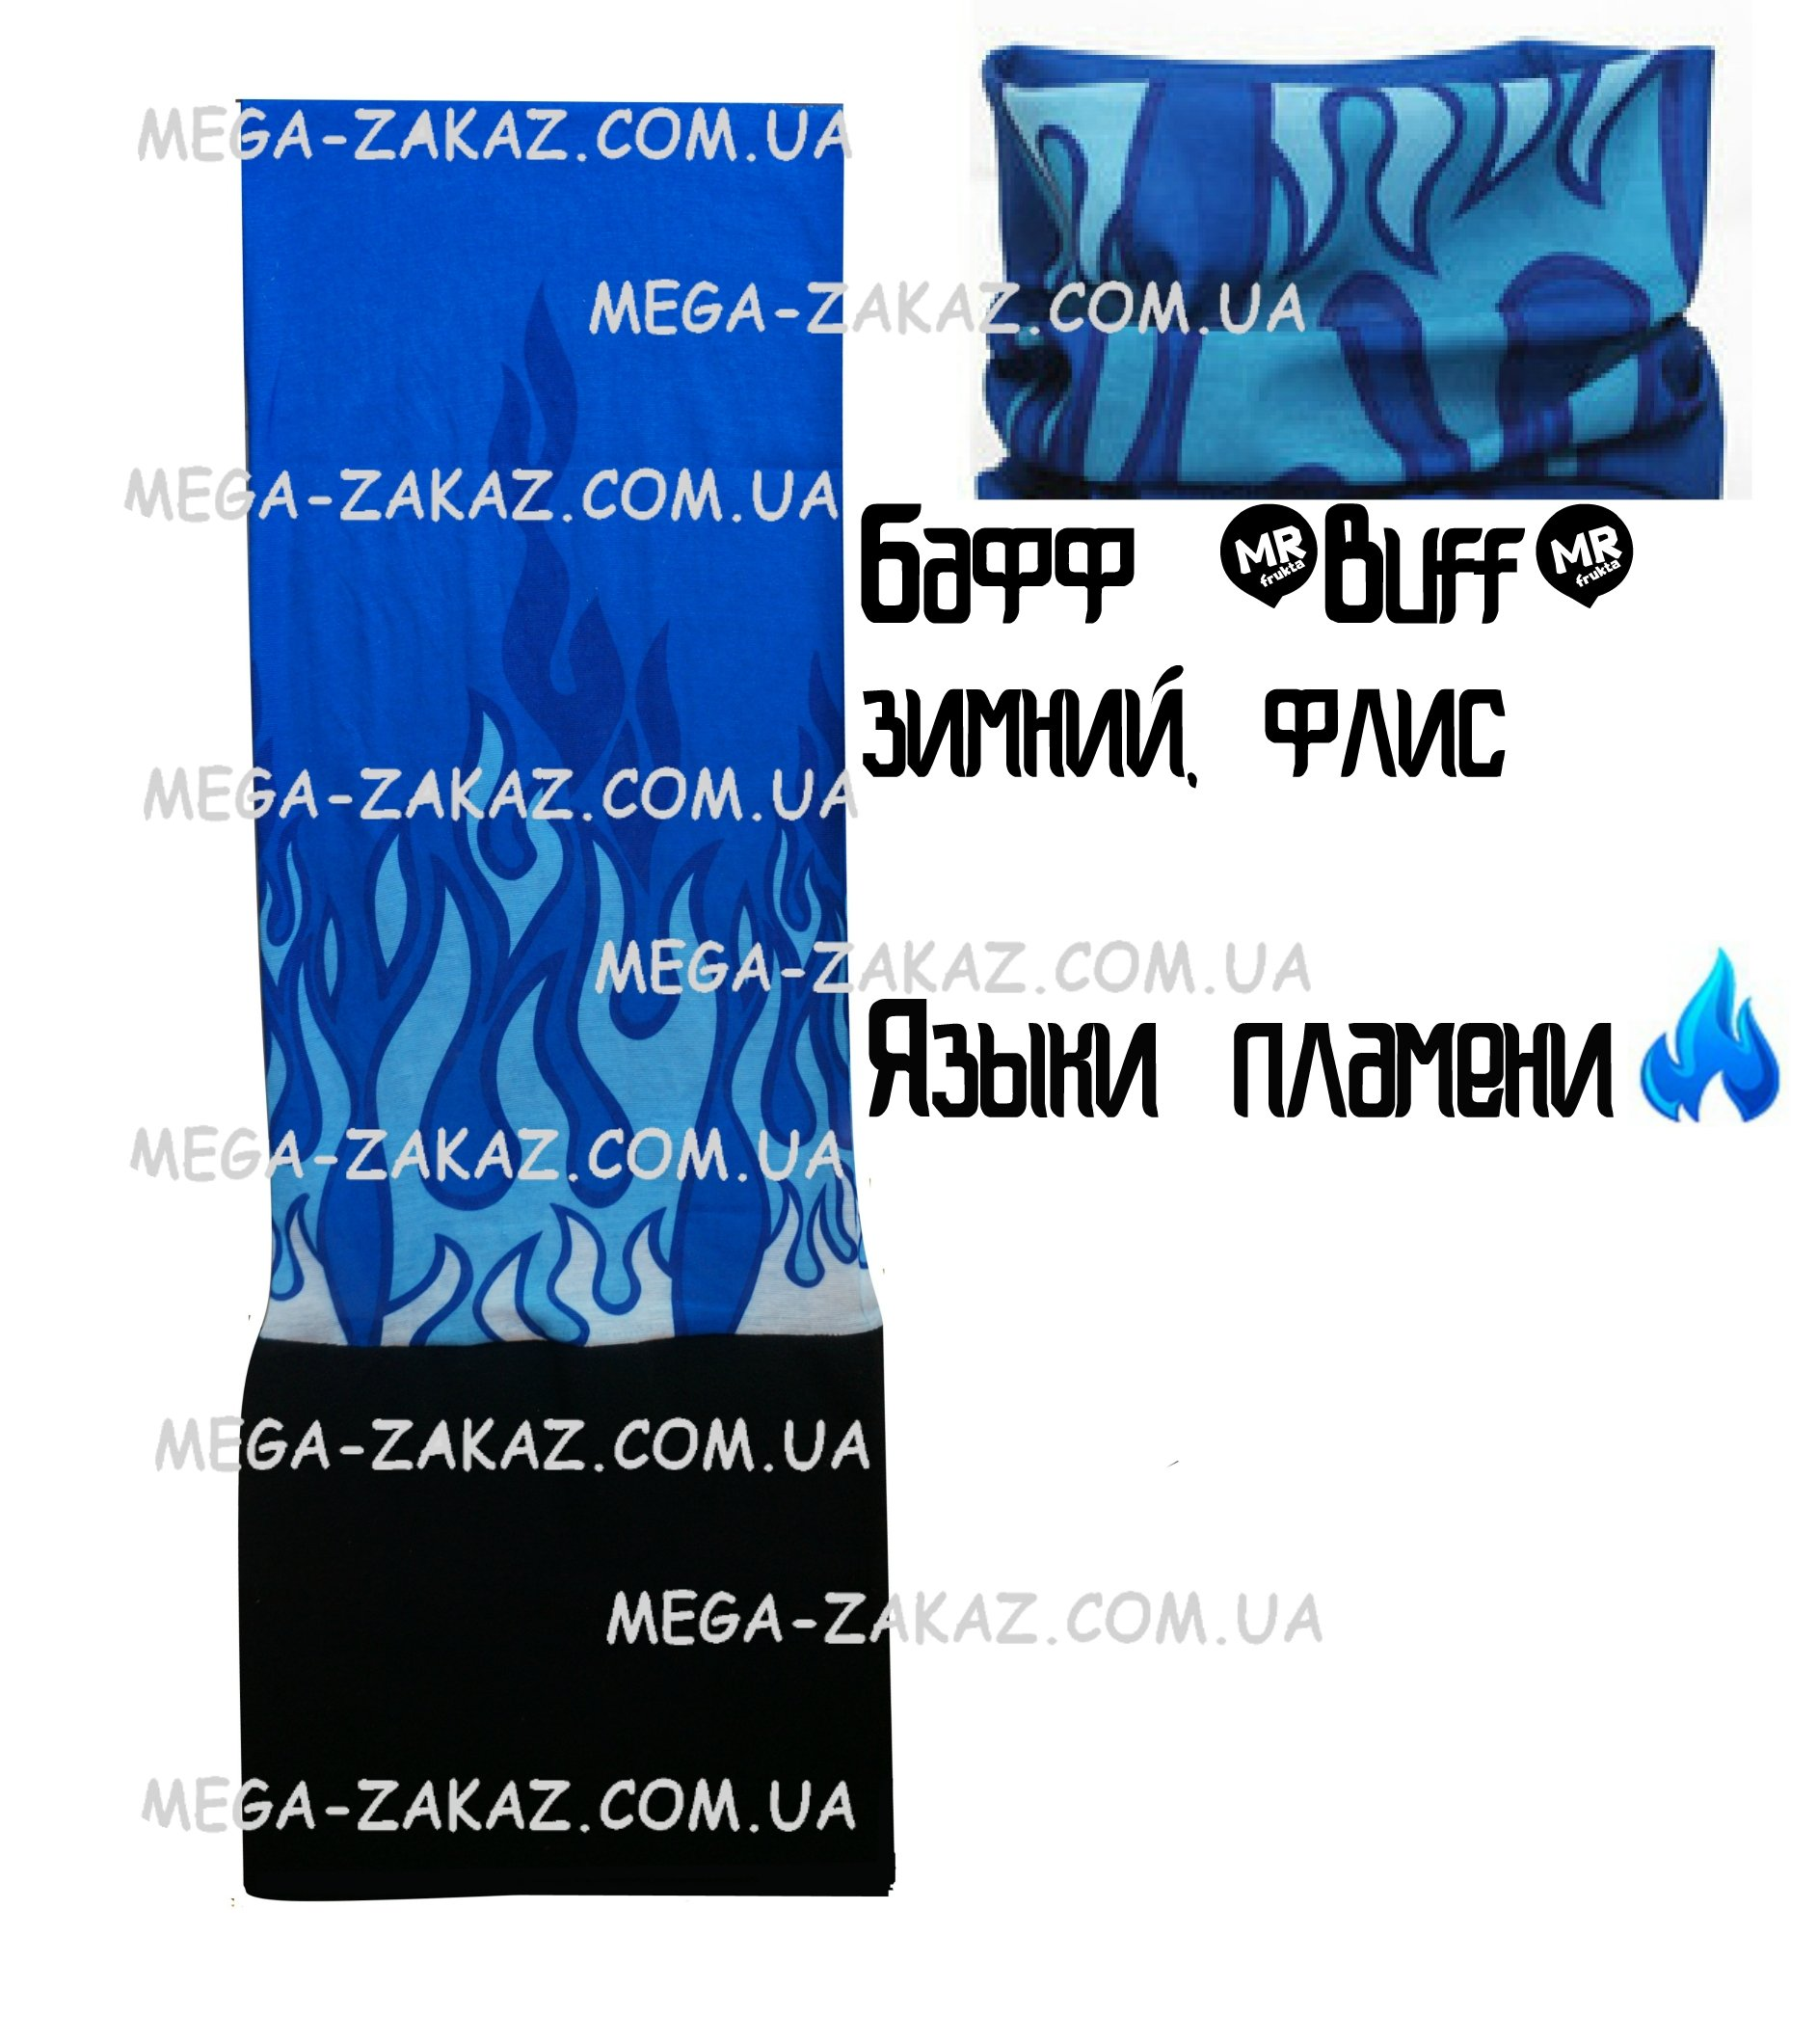 http://mega-zakaz.com.ua/images/upload/blue%20(2)ZAKAZ.jpg